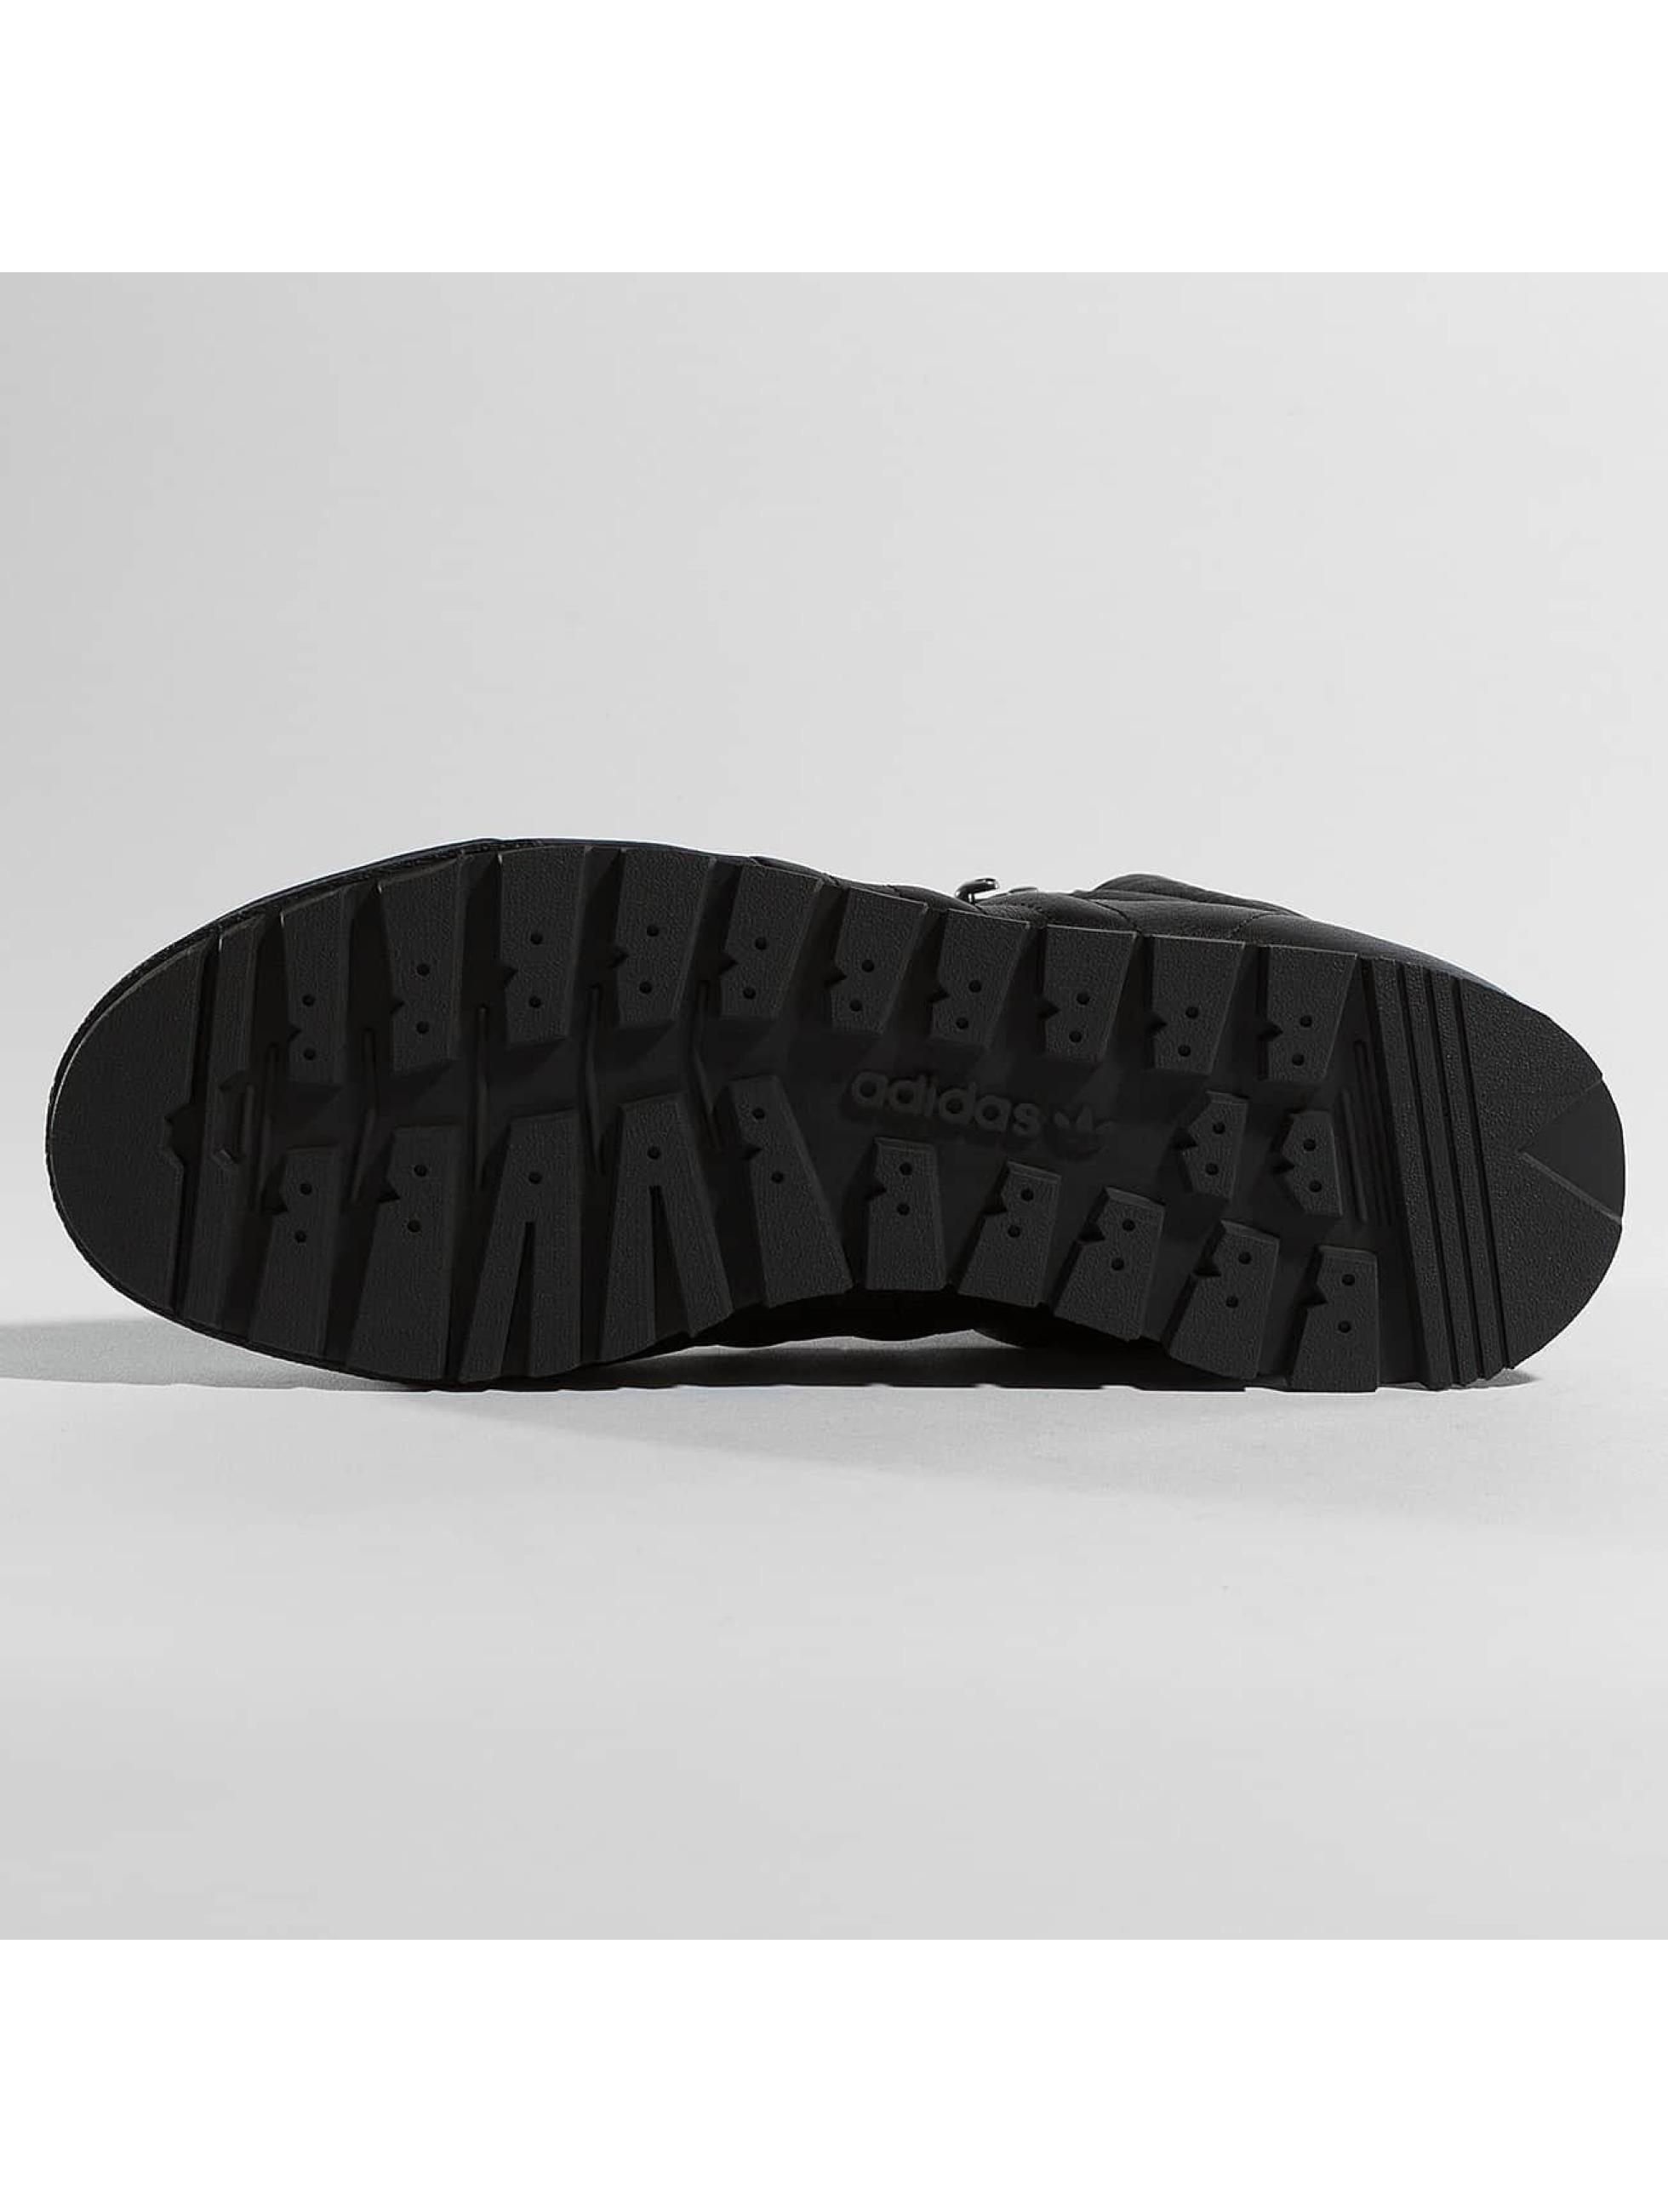 adidas originals Boots Jake Blauvelt Boots black